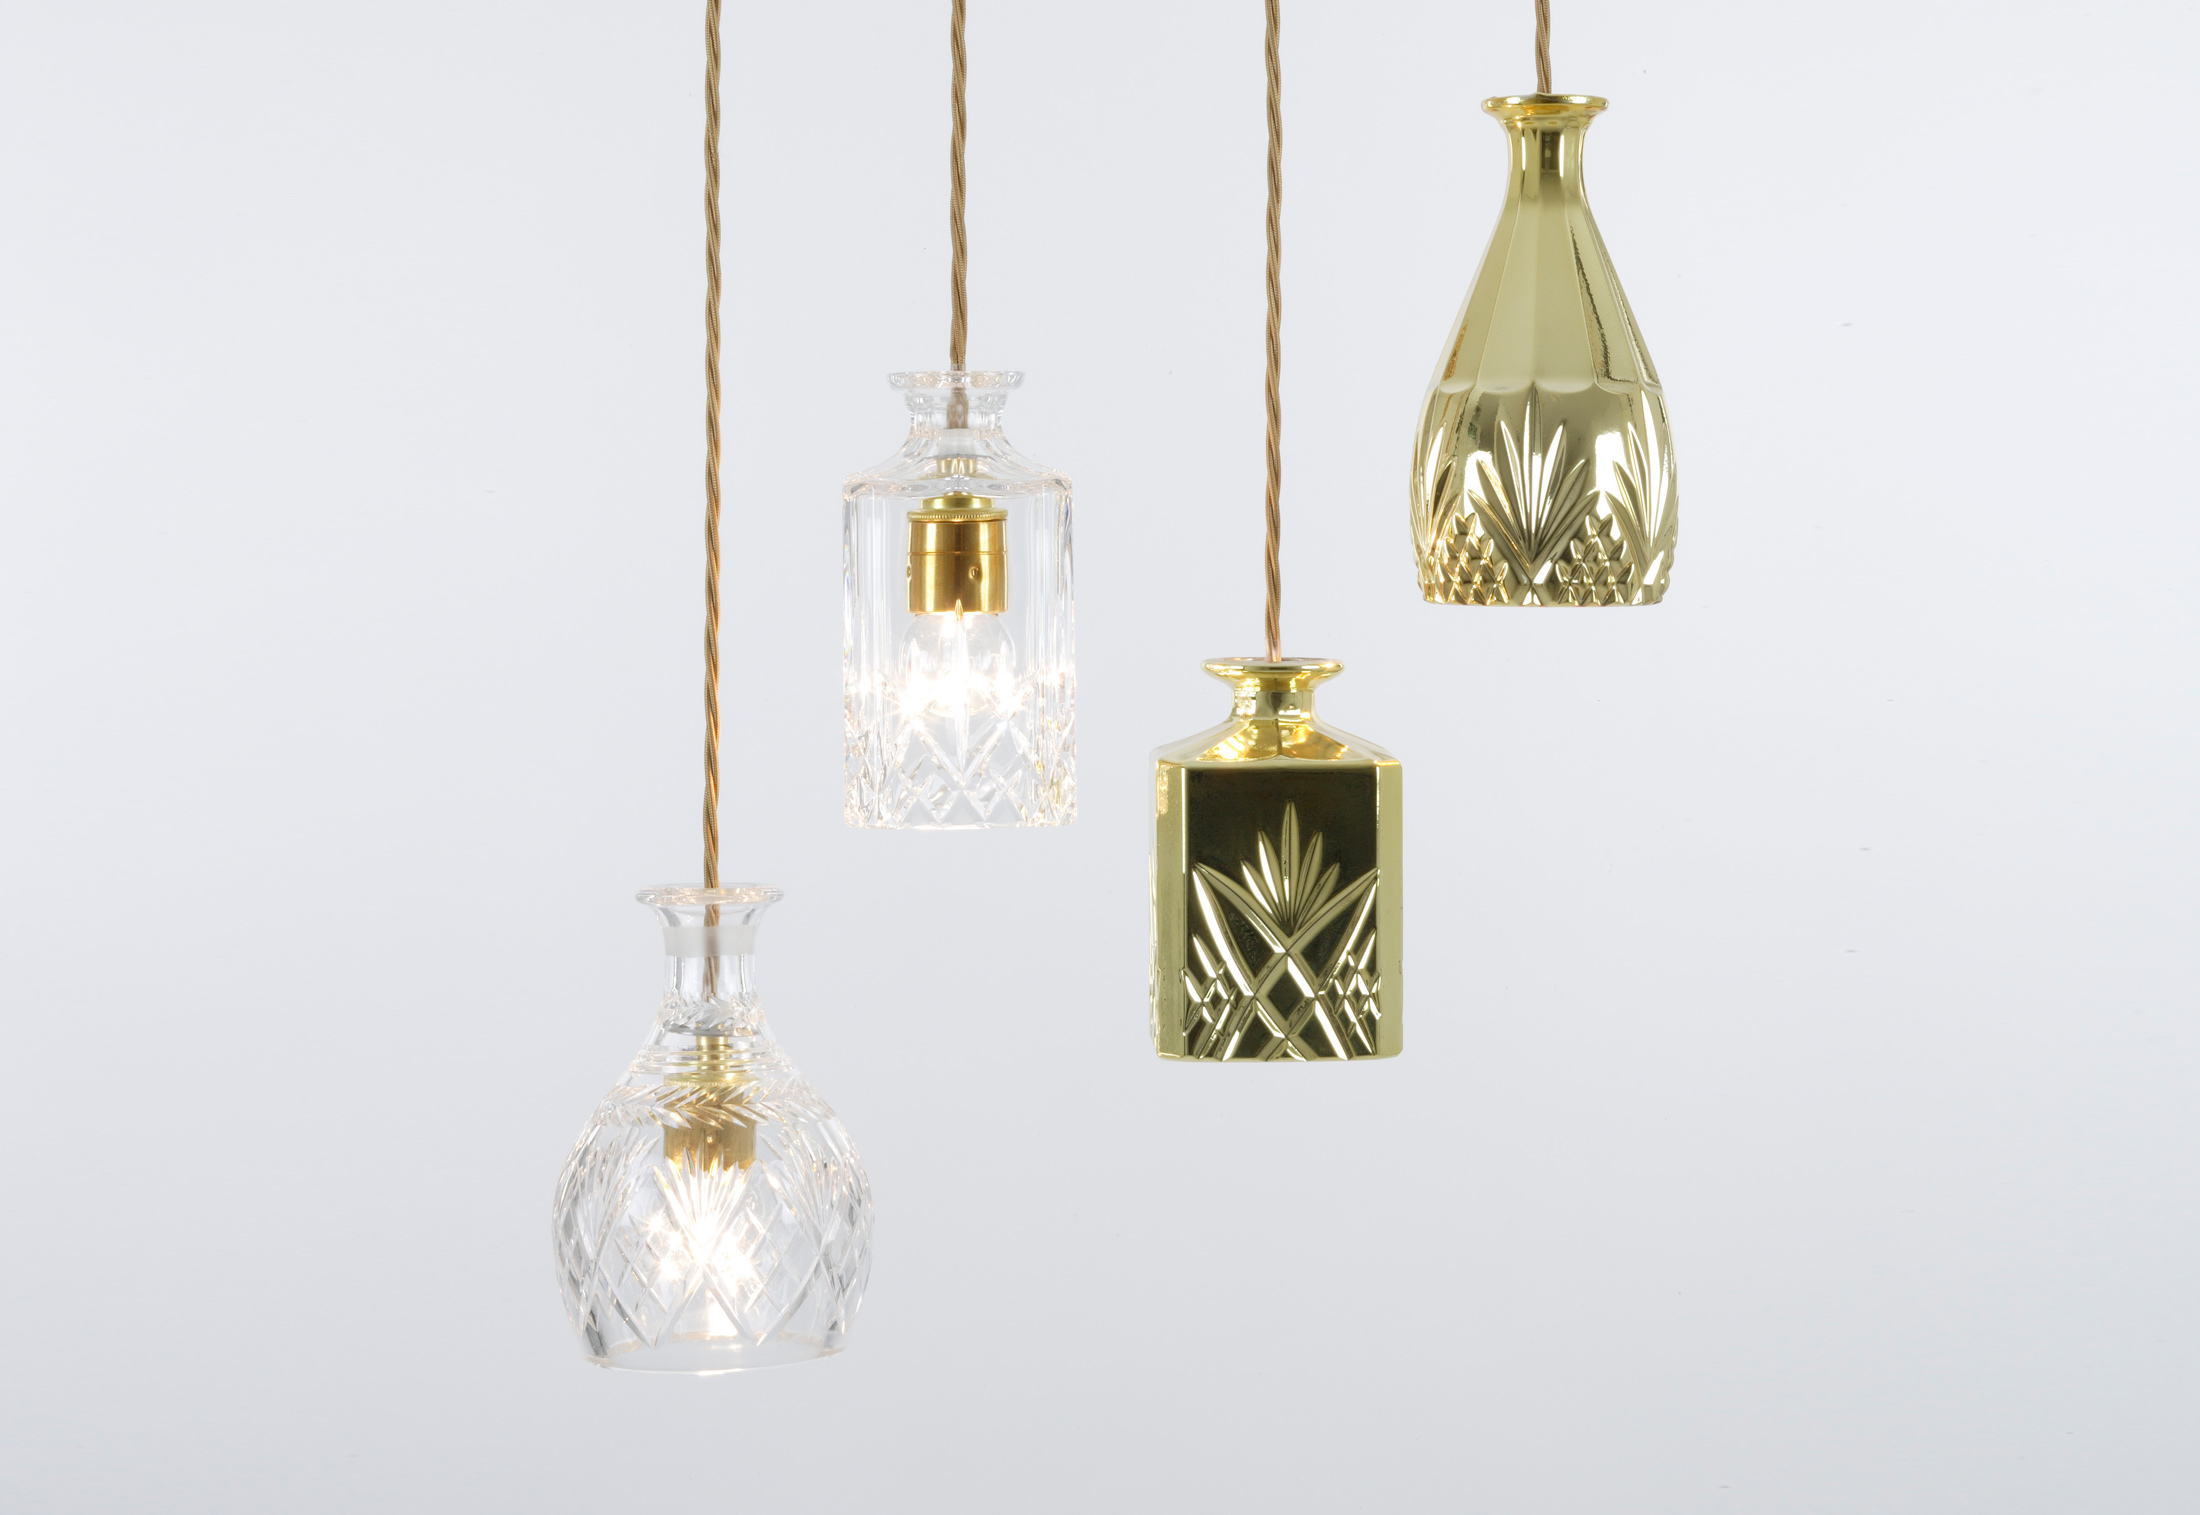 Decanterlight Gold Bell By Lee Broom Stylepark